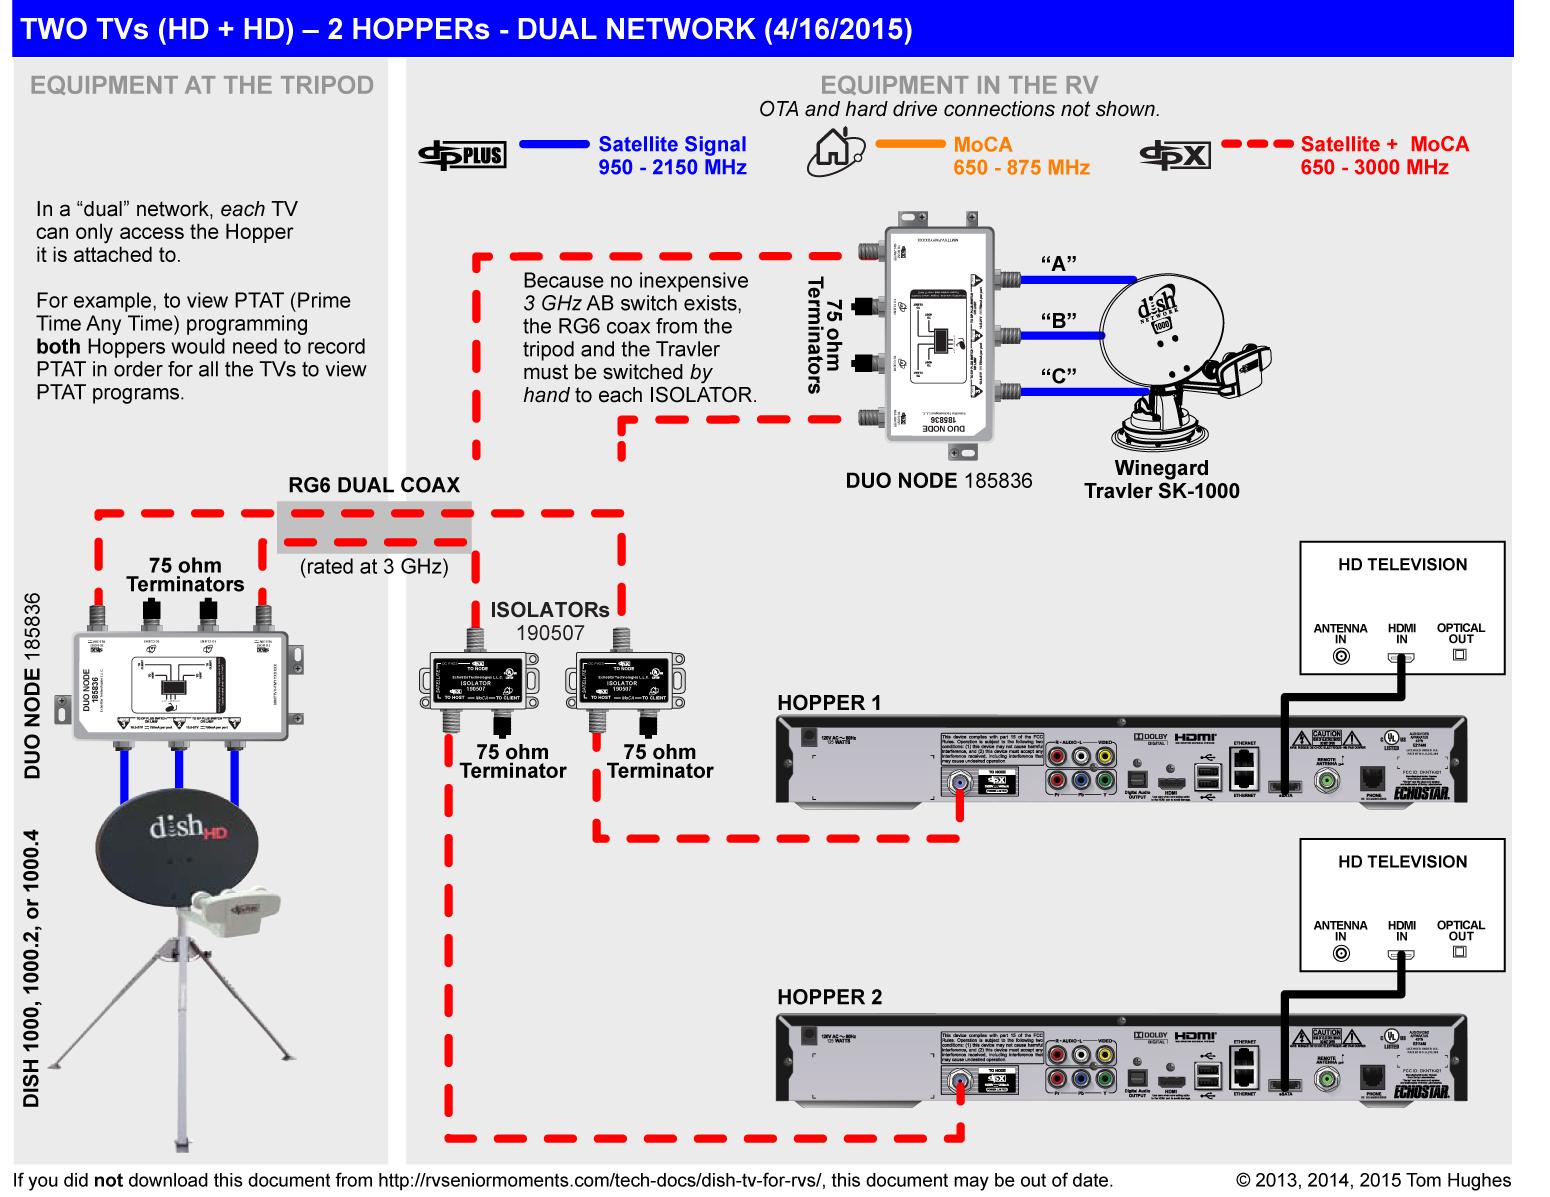 hight resolution of vip 722k wiring diagram wiring diagramvip 722 wiring diagram schematic librarydish vip wiring diagram 1523tefoliade